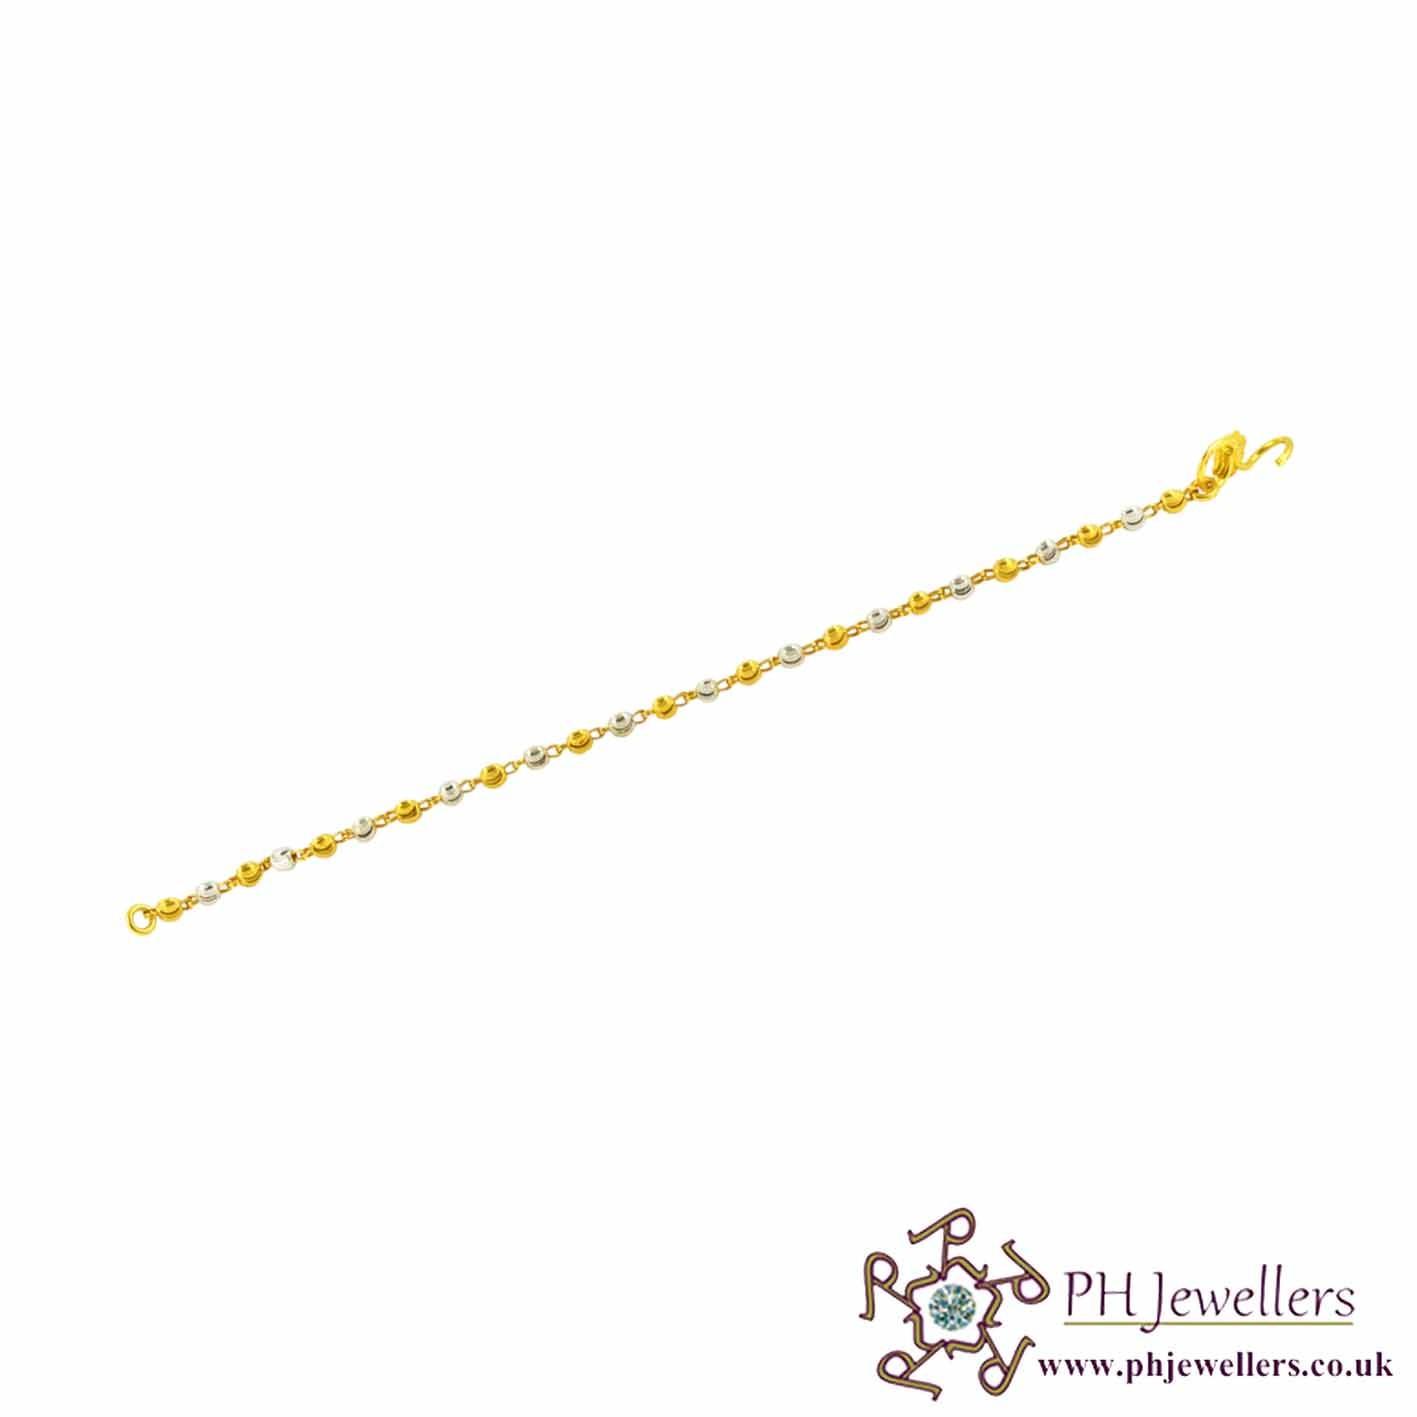 22ct 916 Hallmark Yellow Gold Mania Bracelet KB8